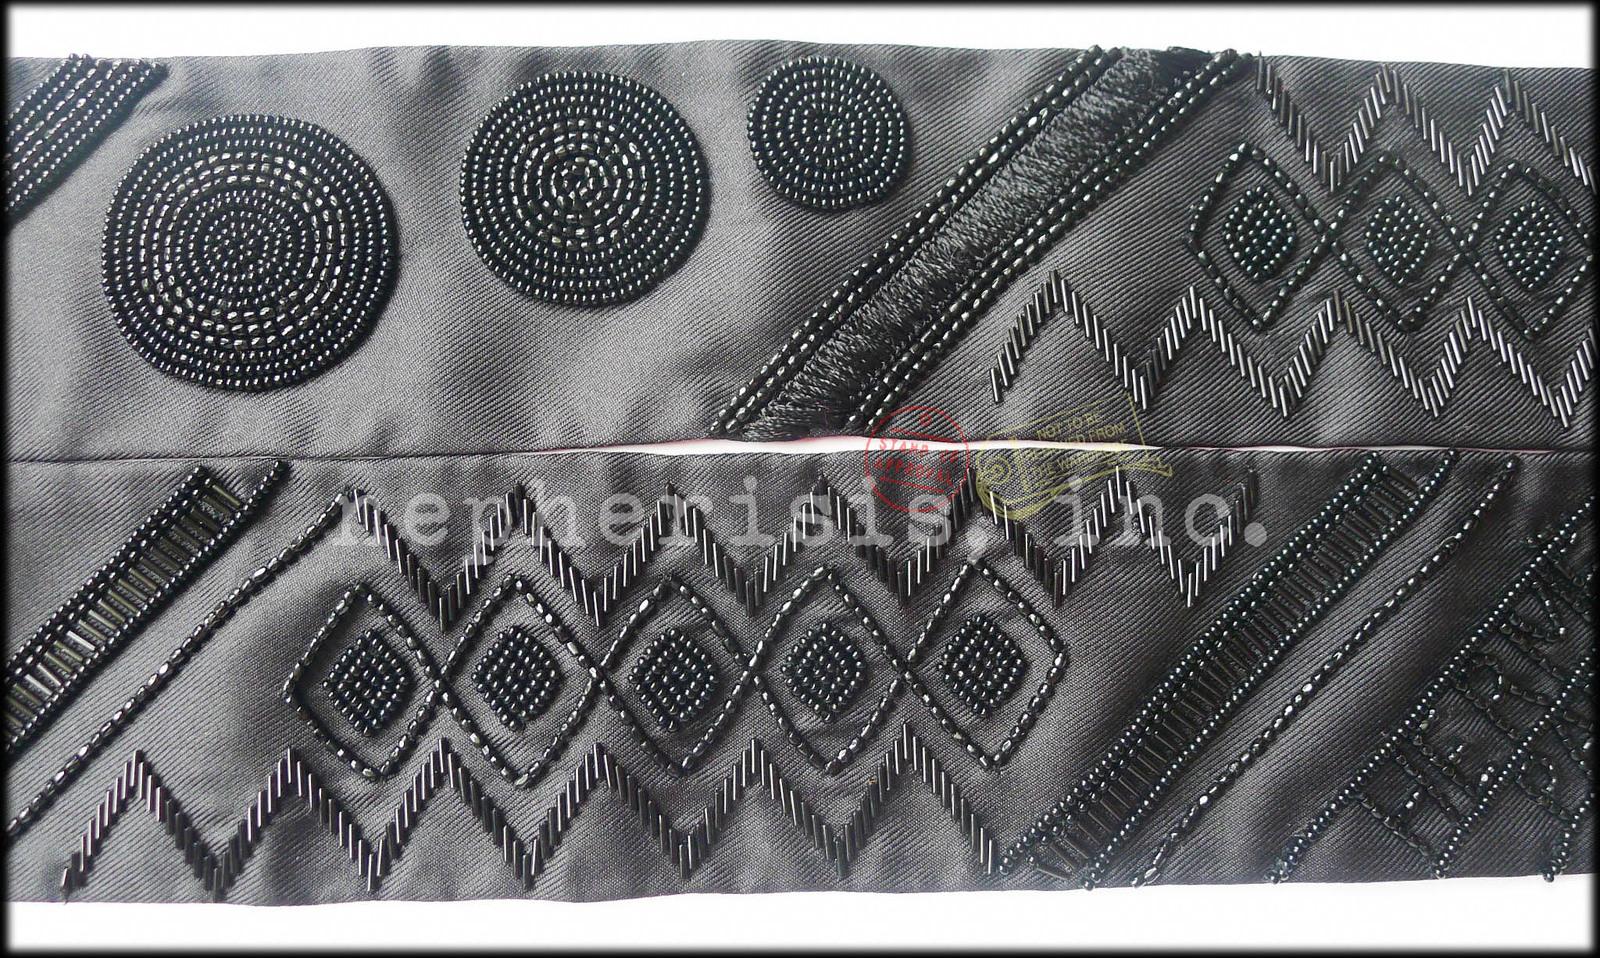 RARE AUTH BNIB Hermes TWILLY PRECIEUX ART DECO Beaded Silk Scarf Black/PINK